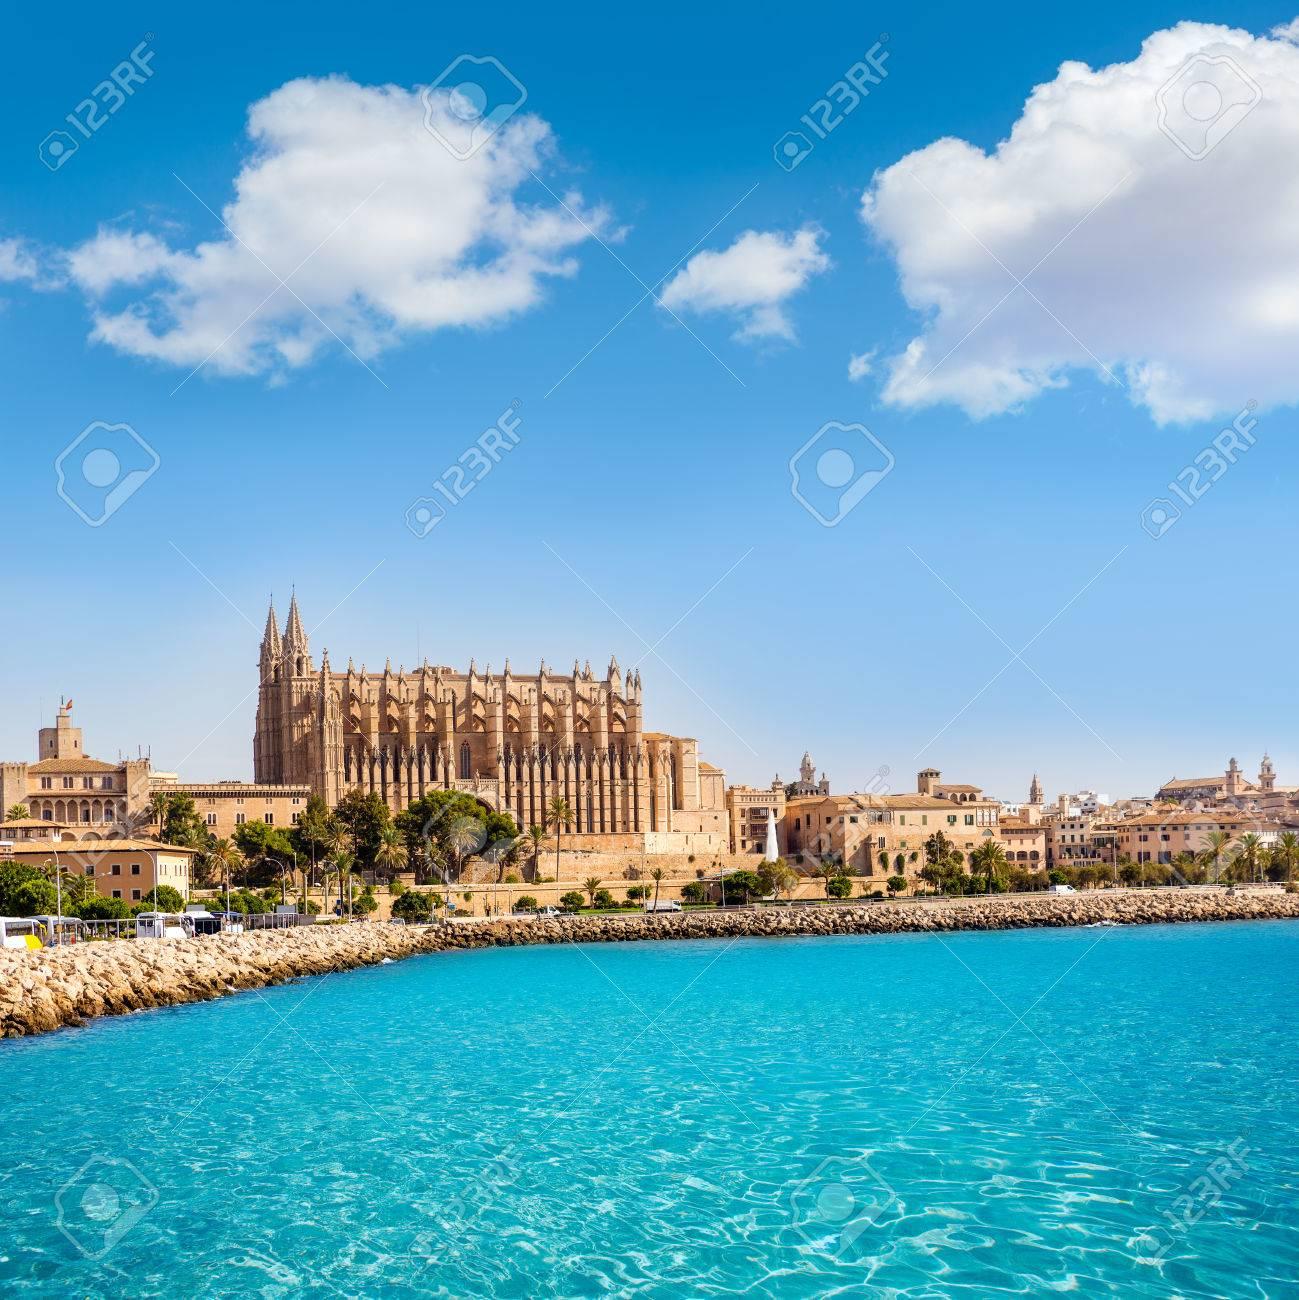 Majorca Palma Cathedral Seu Seo of Mallorca at Balearic Islands Spain - 37632596